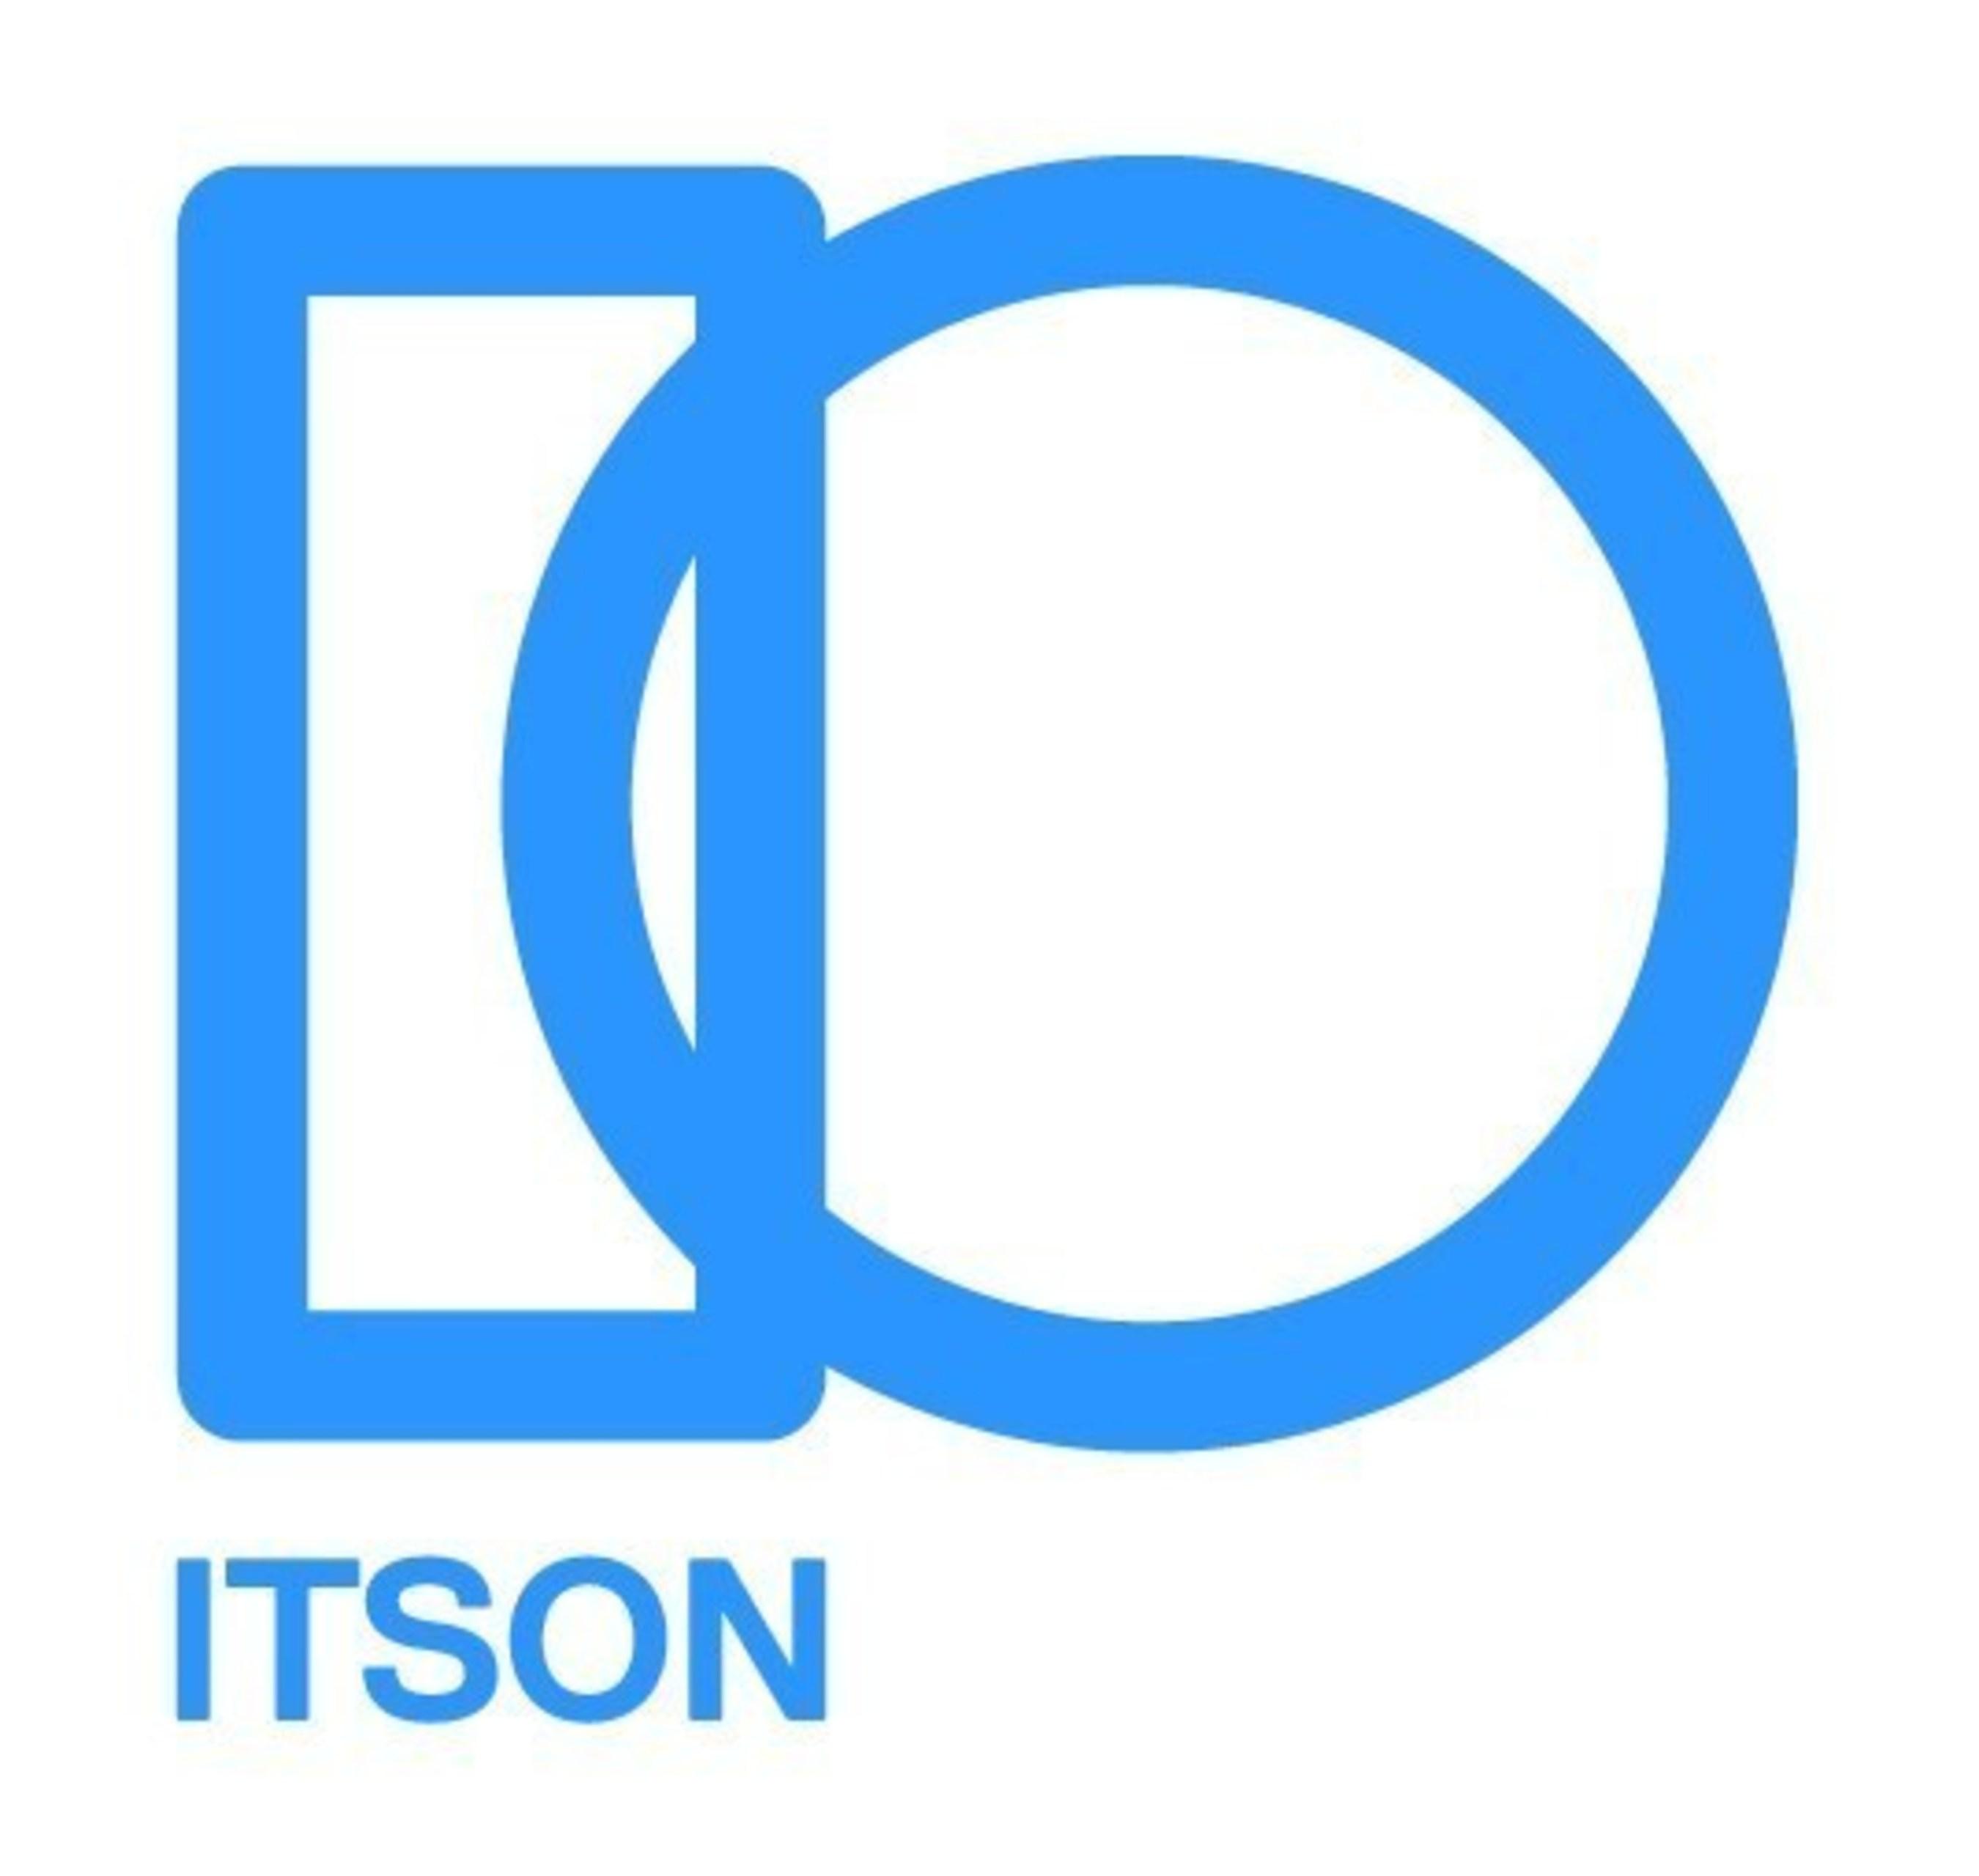 ItsOn Winner of Telecoms.com Cloud Innovation Award